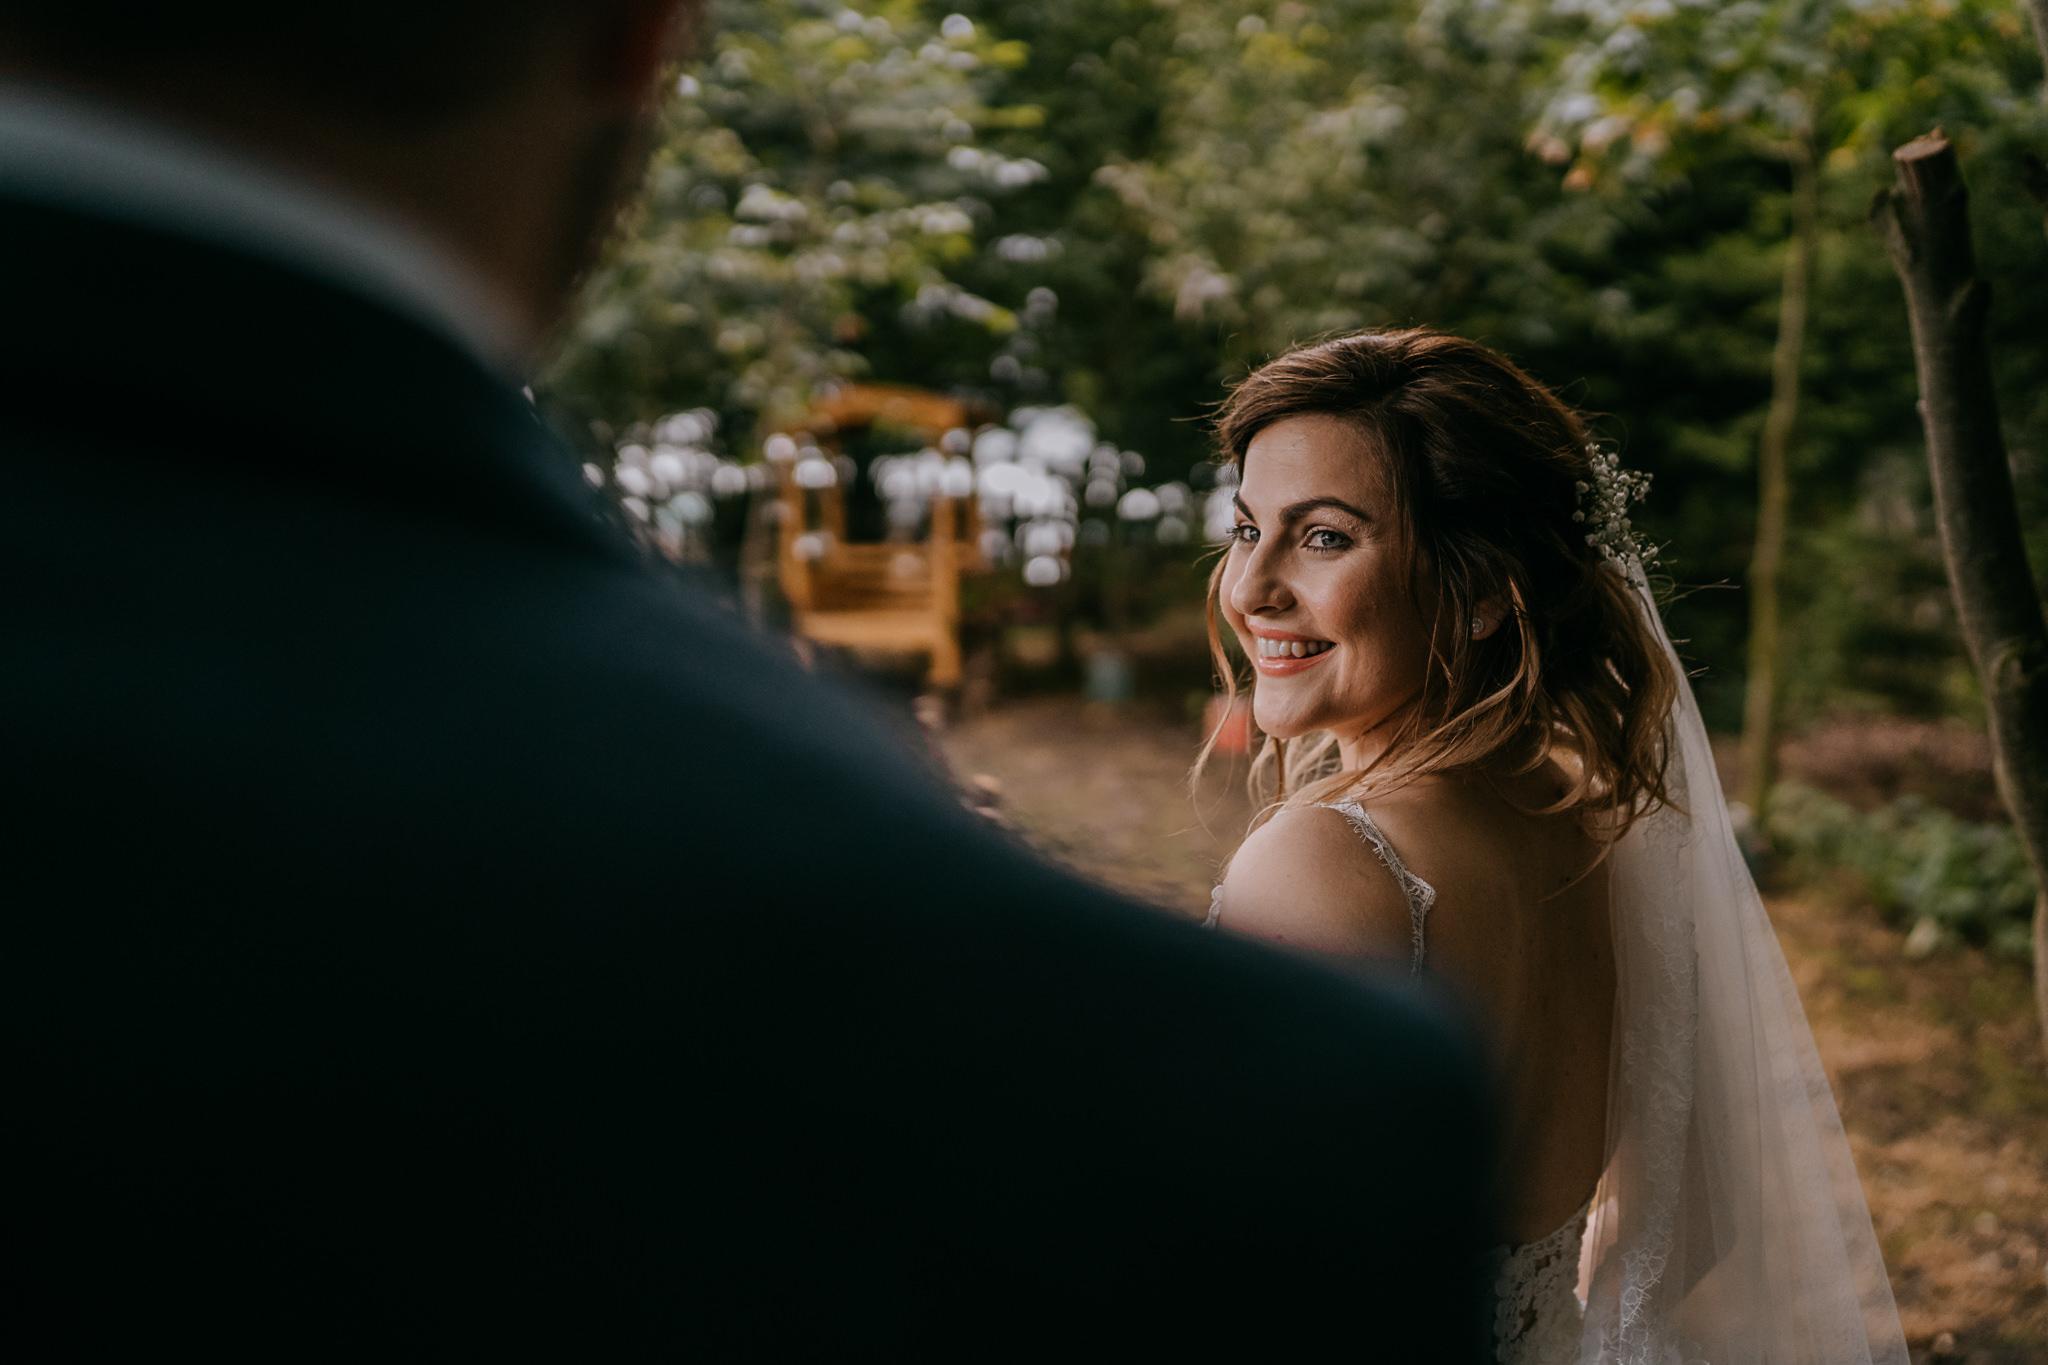 Northern-Ireland-wedding-photographers-the-martins-outdoor-barn-wedding-127.jpg